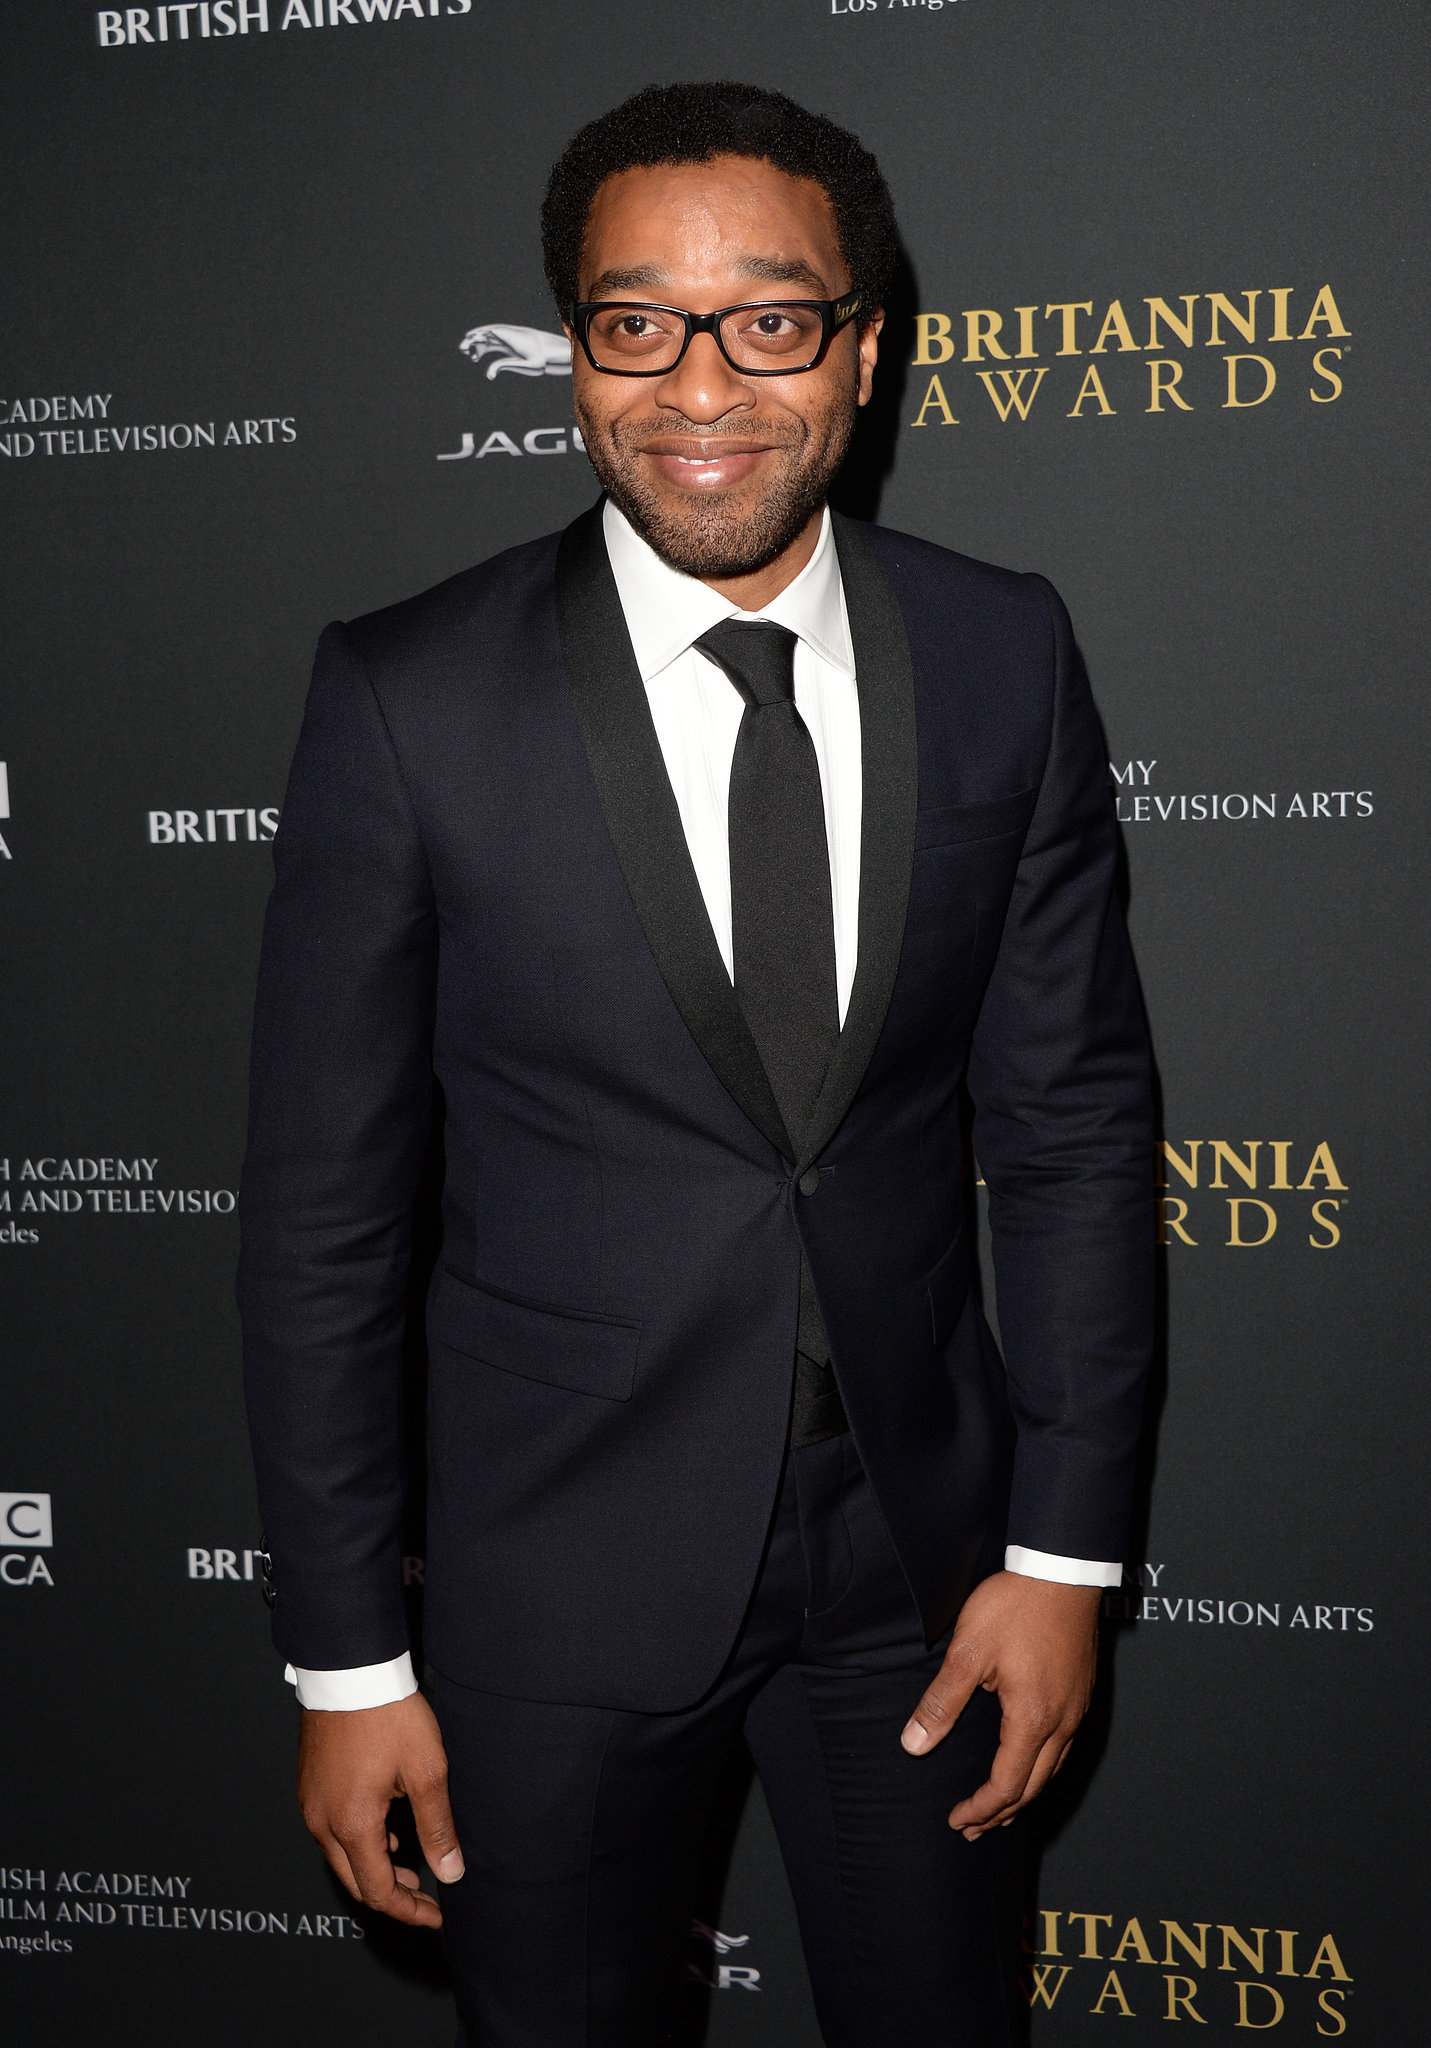 Chiwetel Ejiofor attended the BAFTA LA Jaguar Britannia Awards.